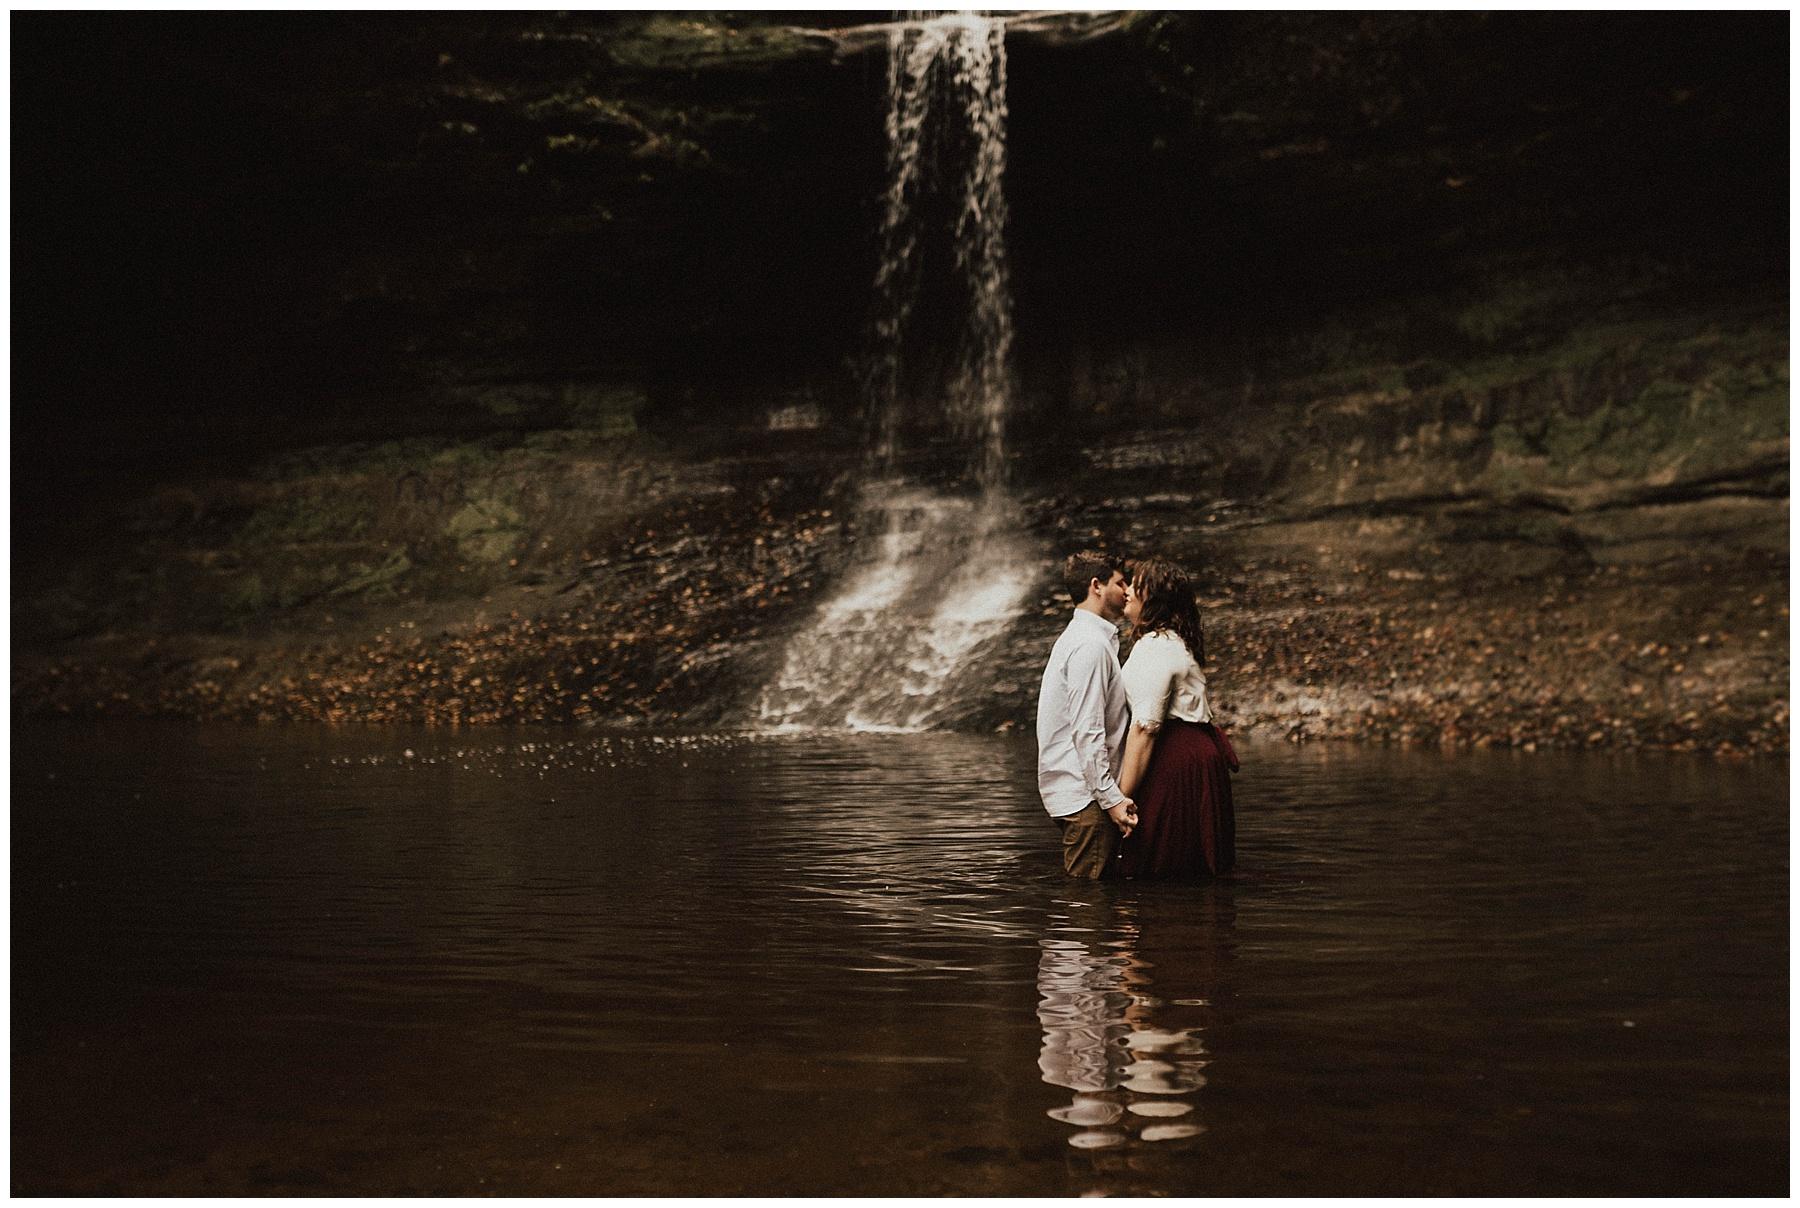 Jared + Brooke Lauren F.otography | Central Illinois